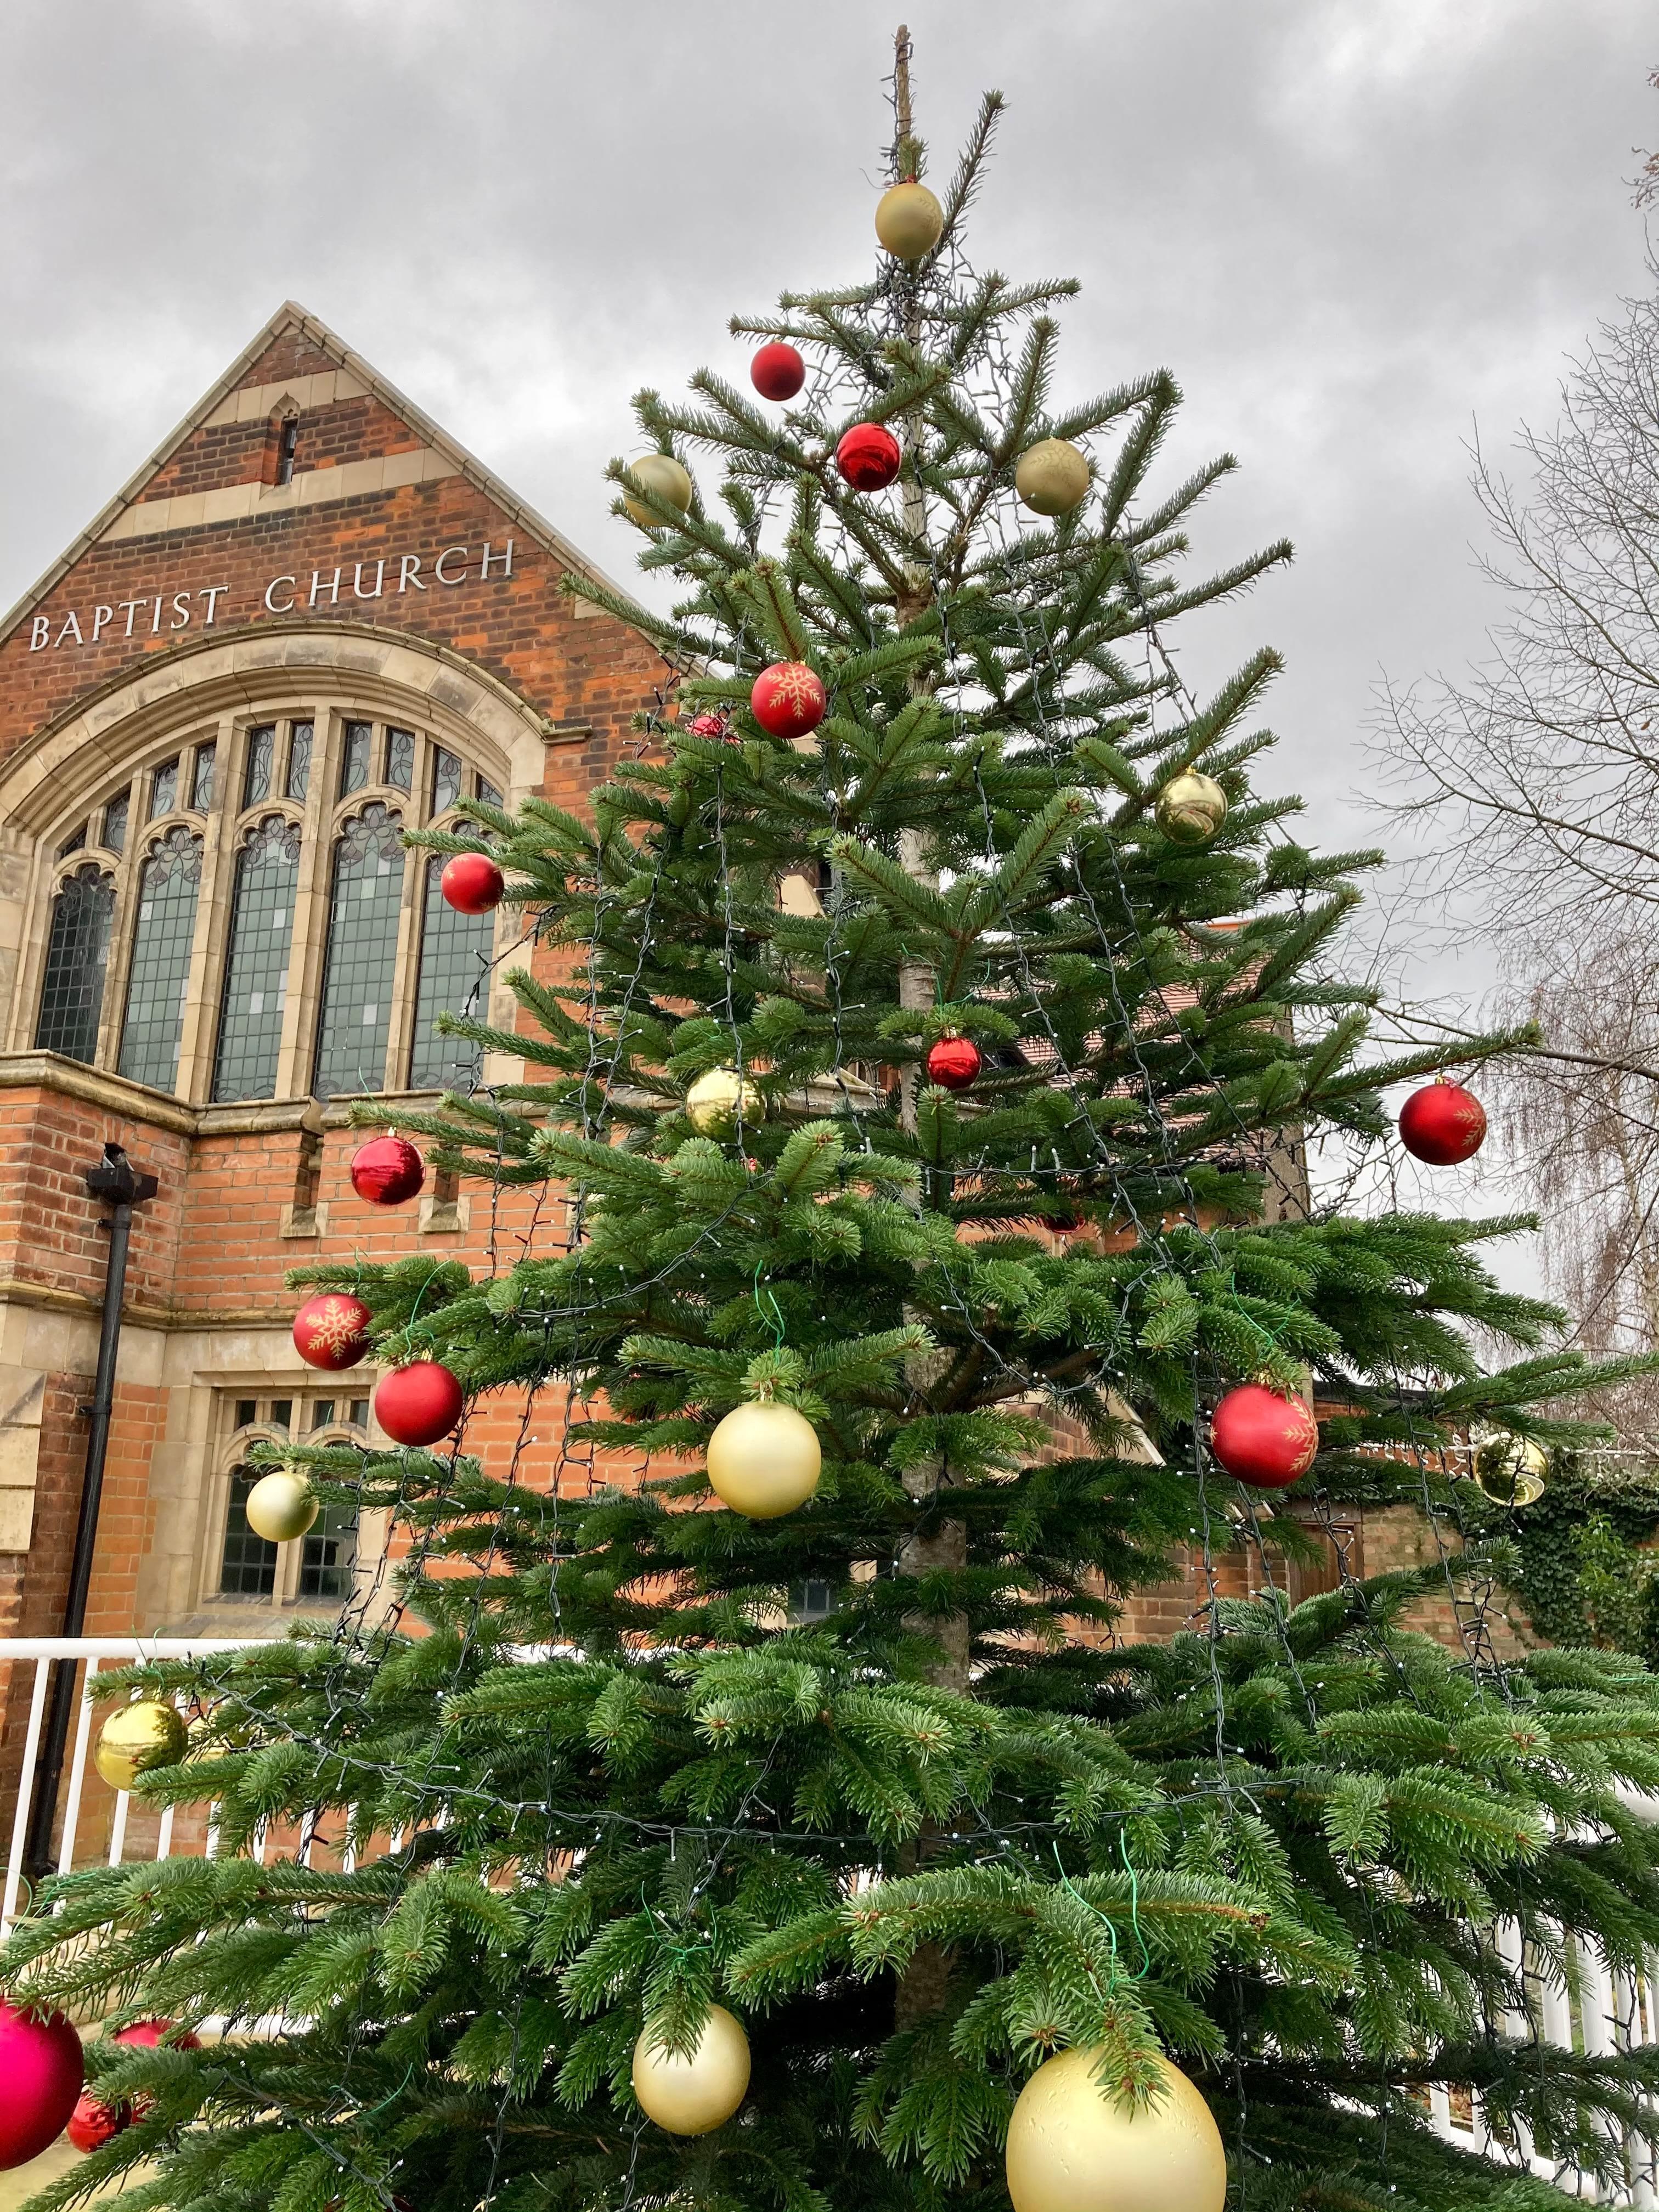 Christmas tree decorated, good job all!